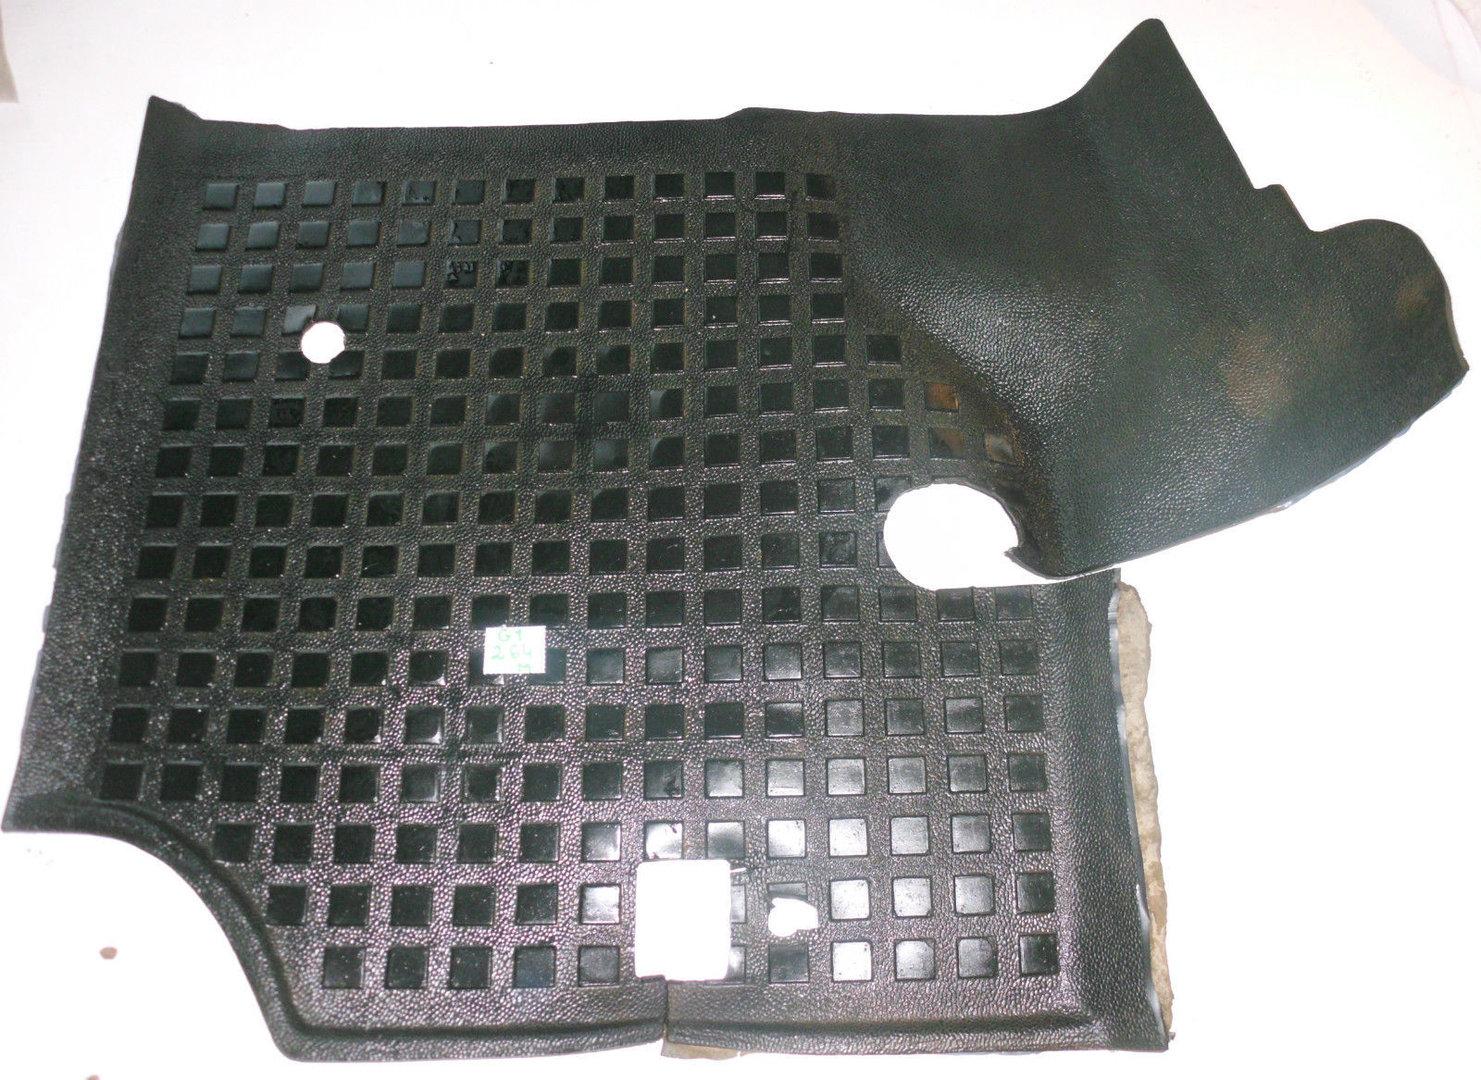 IVECO MK 8013 Teile Teppich Gummimatte Gummi Matte